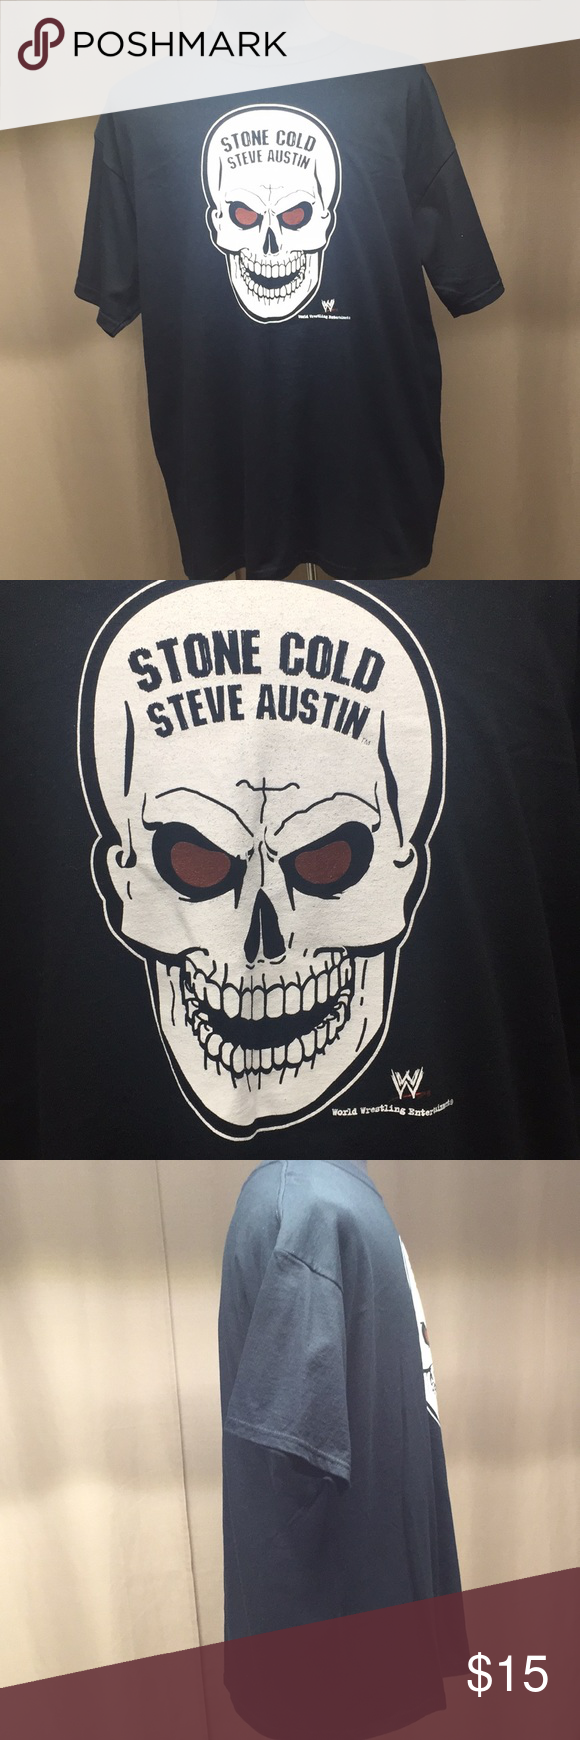 Stone Cold Podcast Logo By Https Darkvoidpictures Deviantart Com On Deviantart Steve Austin Stone Cold Steve Austin Wwe